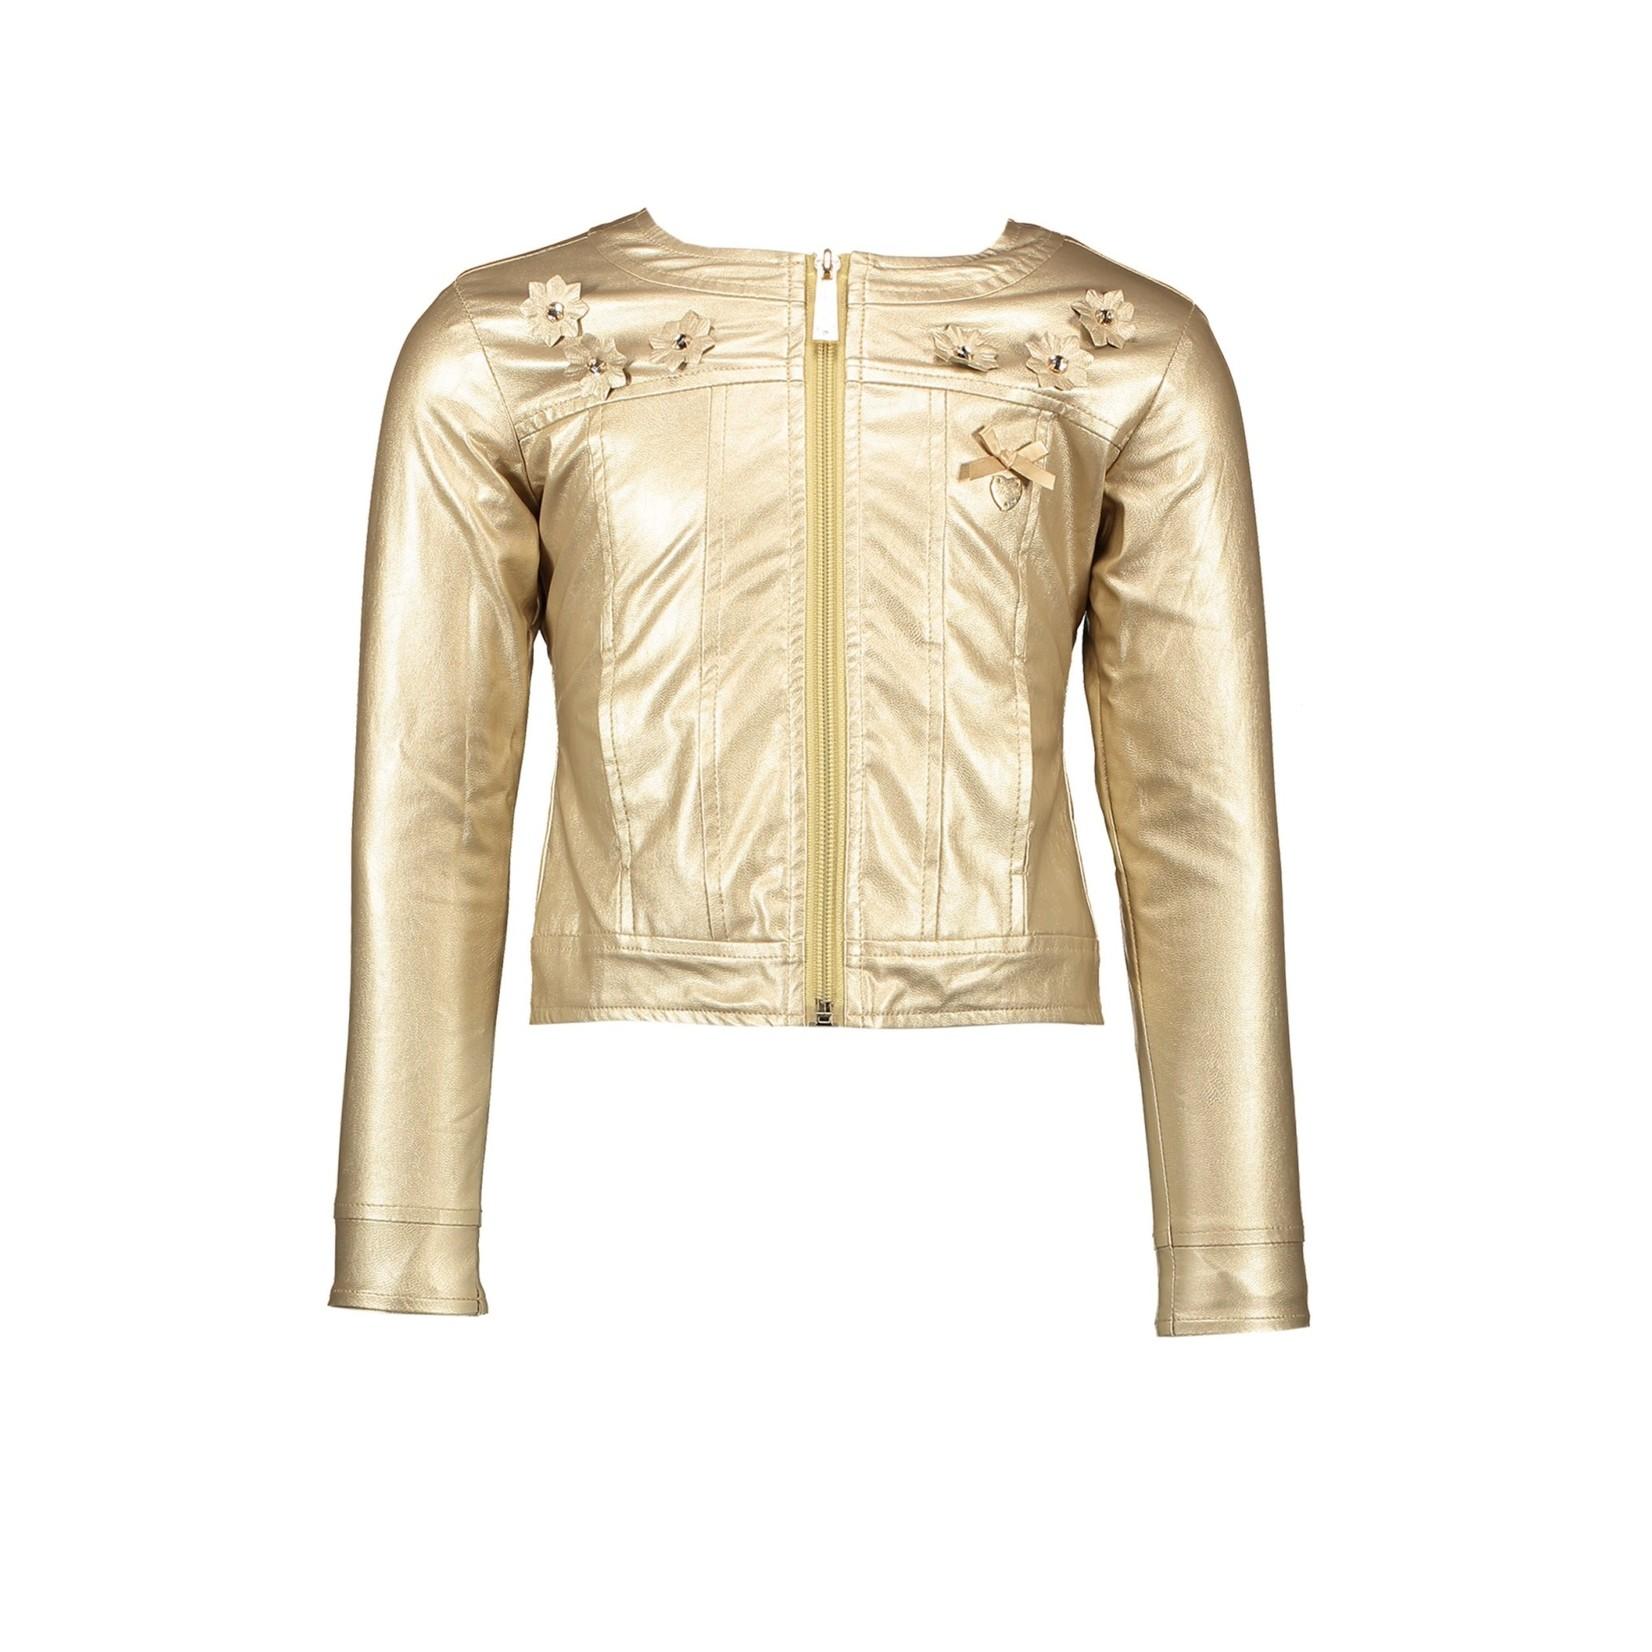 Le Chic jacket precious gold metal